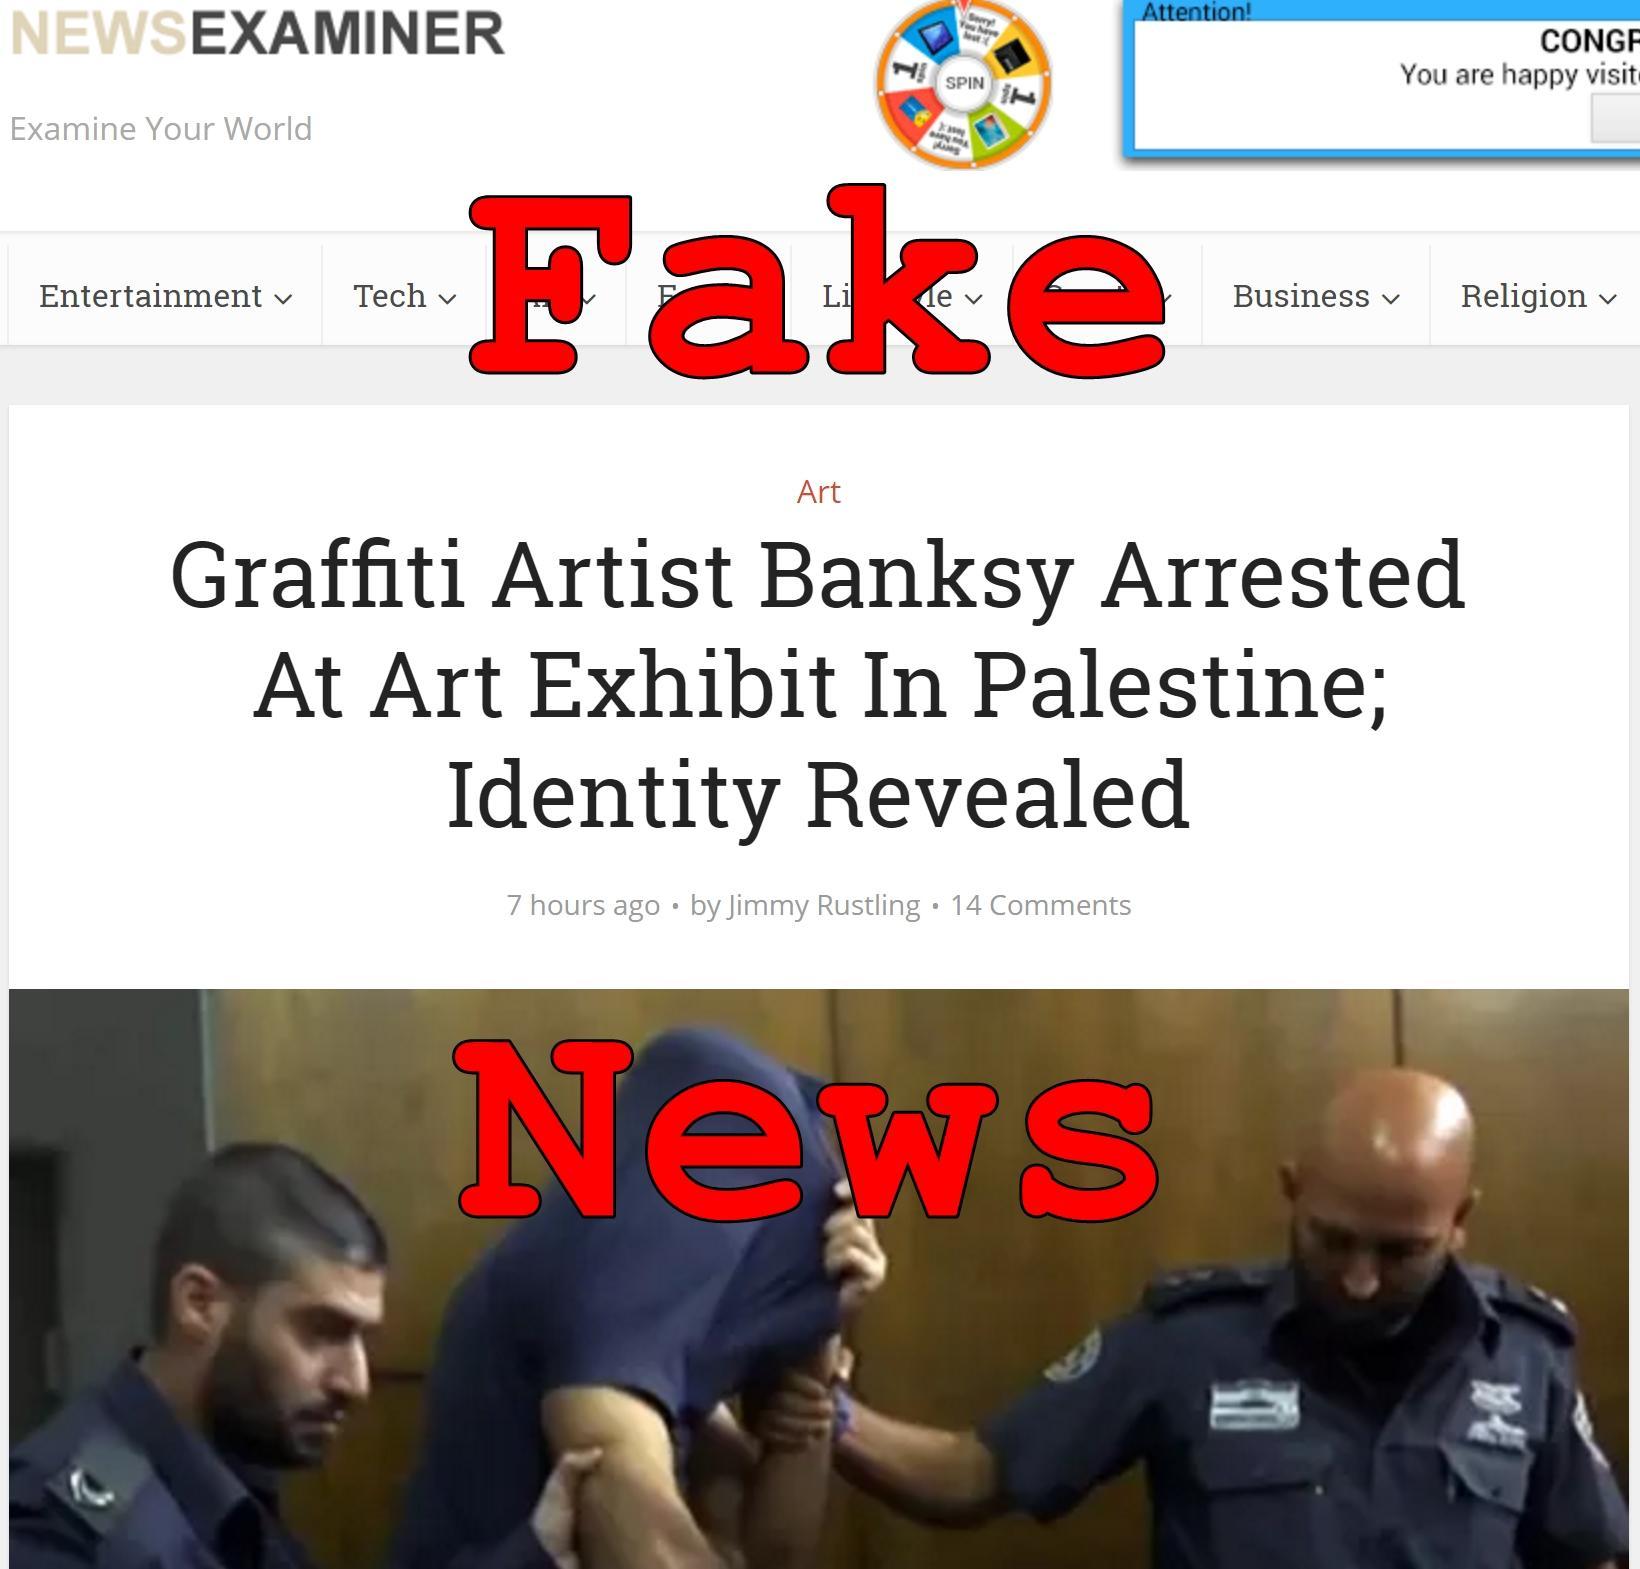 Fake News: Graffiti Artist Banksy NOT Arrested At Art Exhibit In Palestine; Identity NOT Revealed